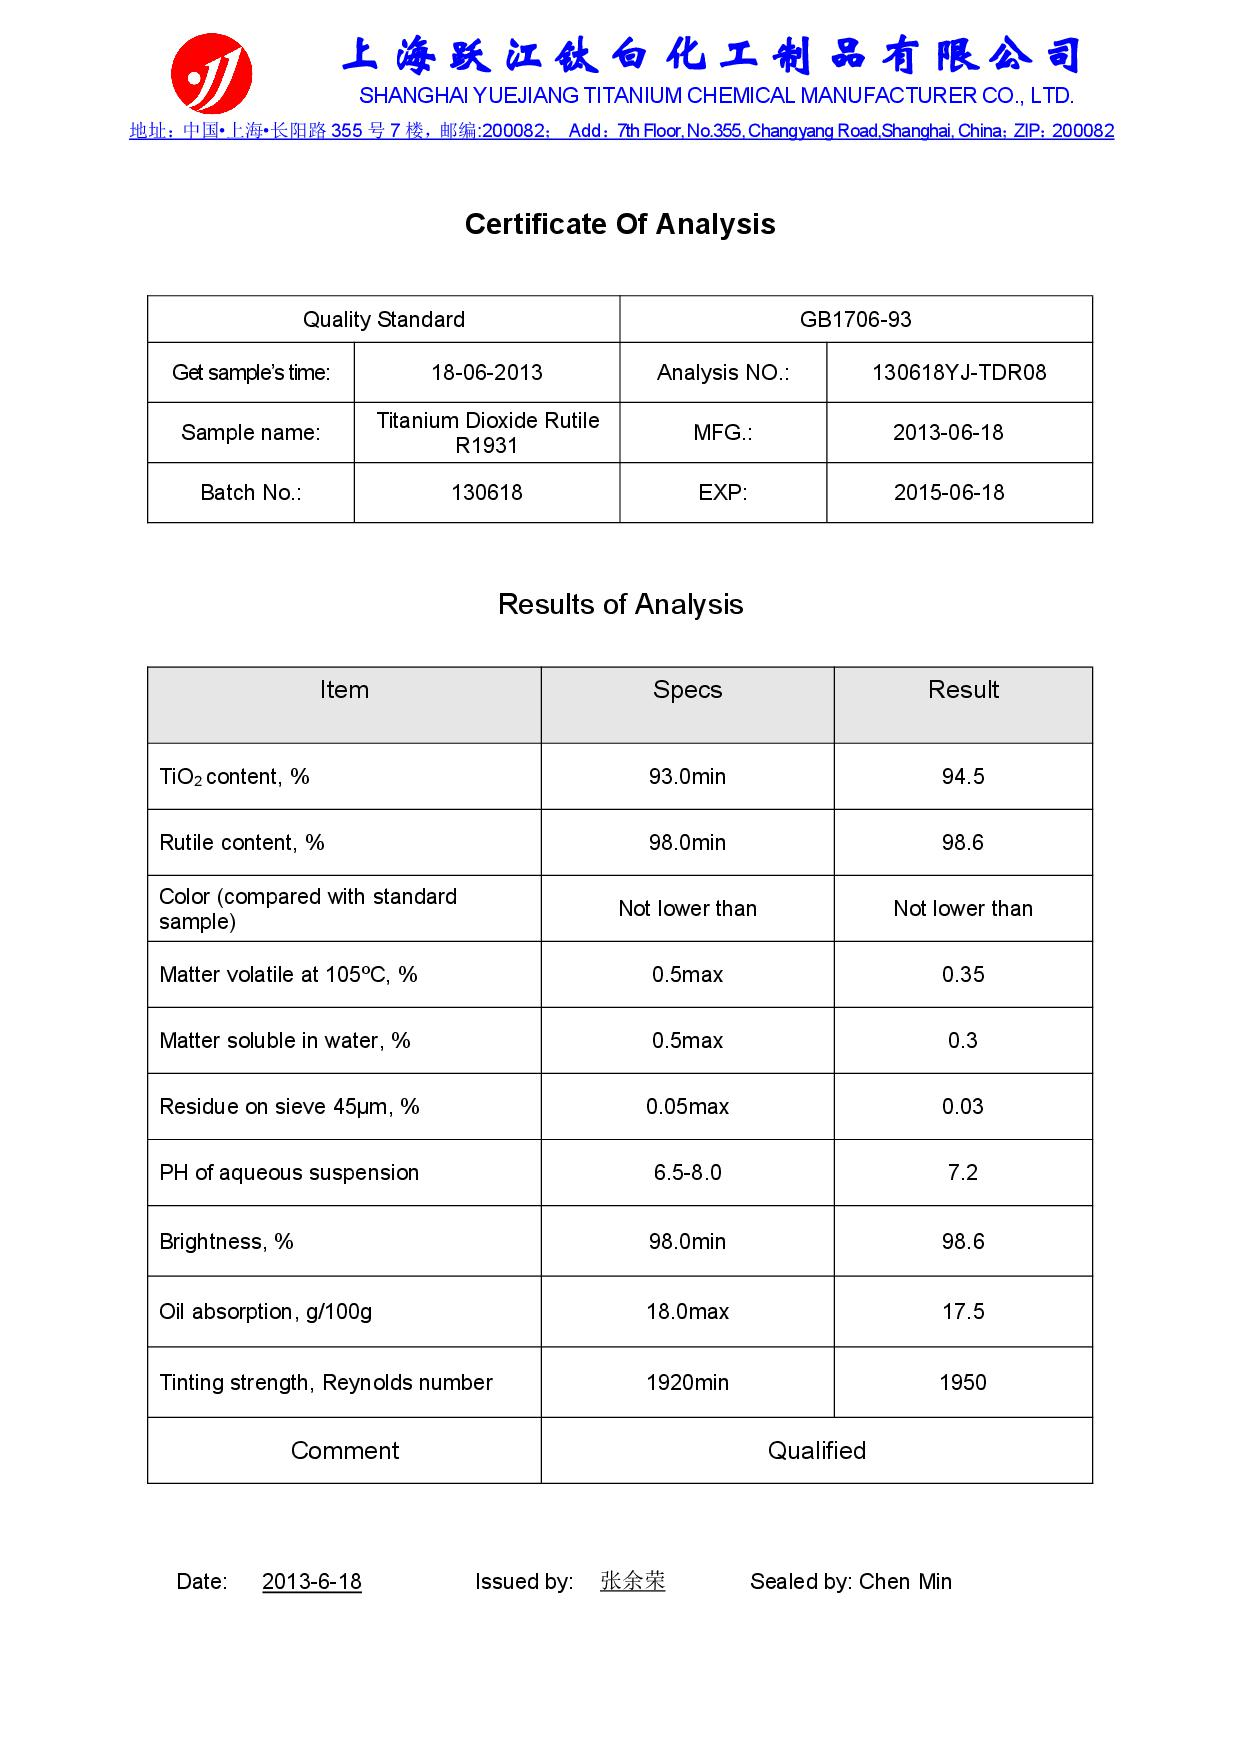 Titanium Dioxide Rutile R1931 Chloride Process